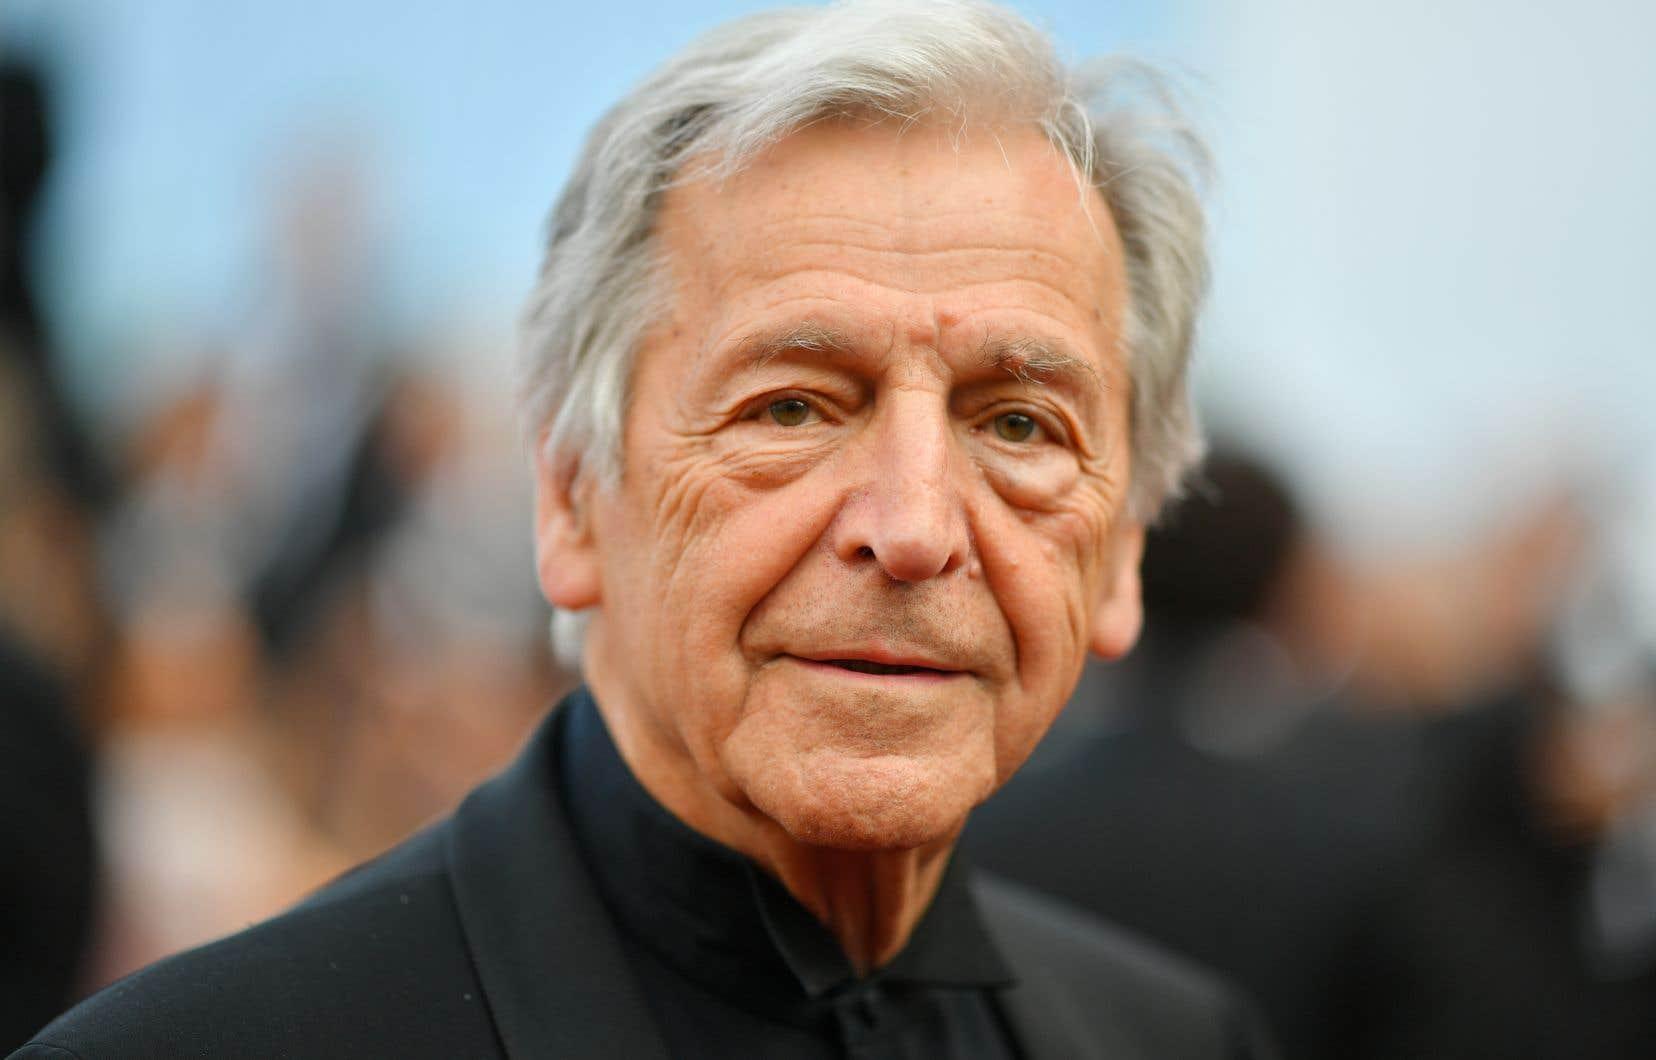 Costa-Gavras au Festival de Cannes en 2017